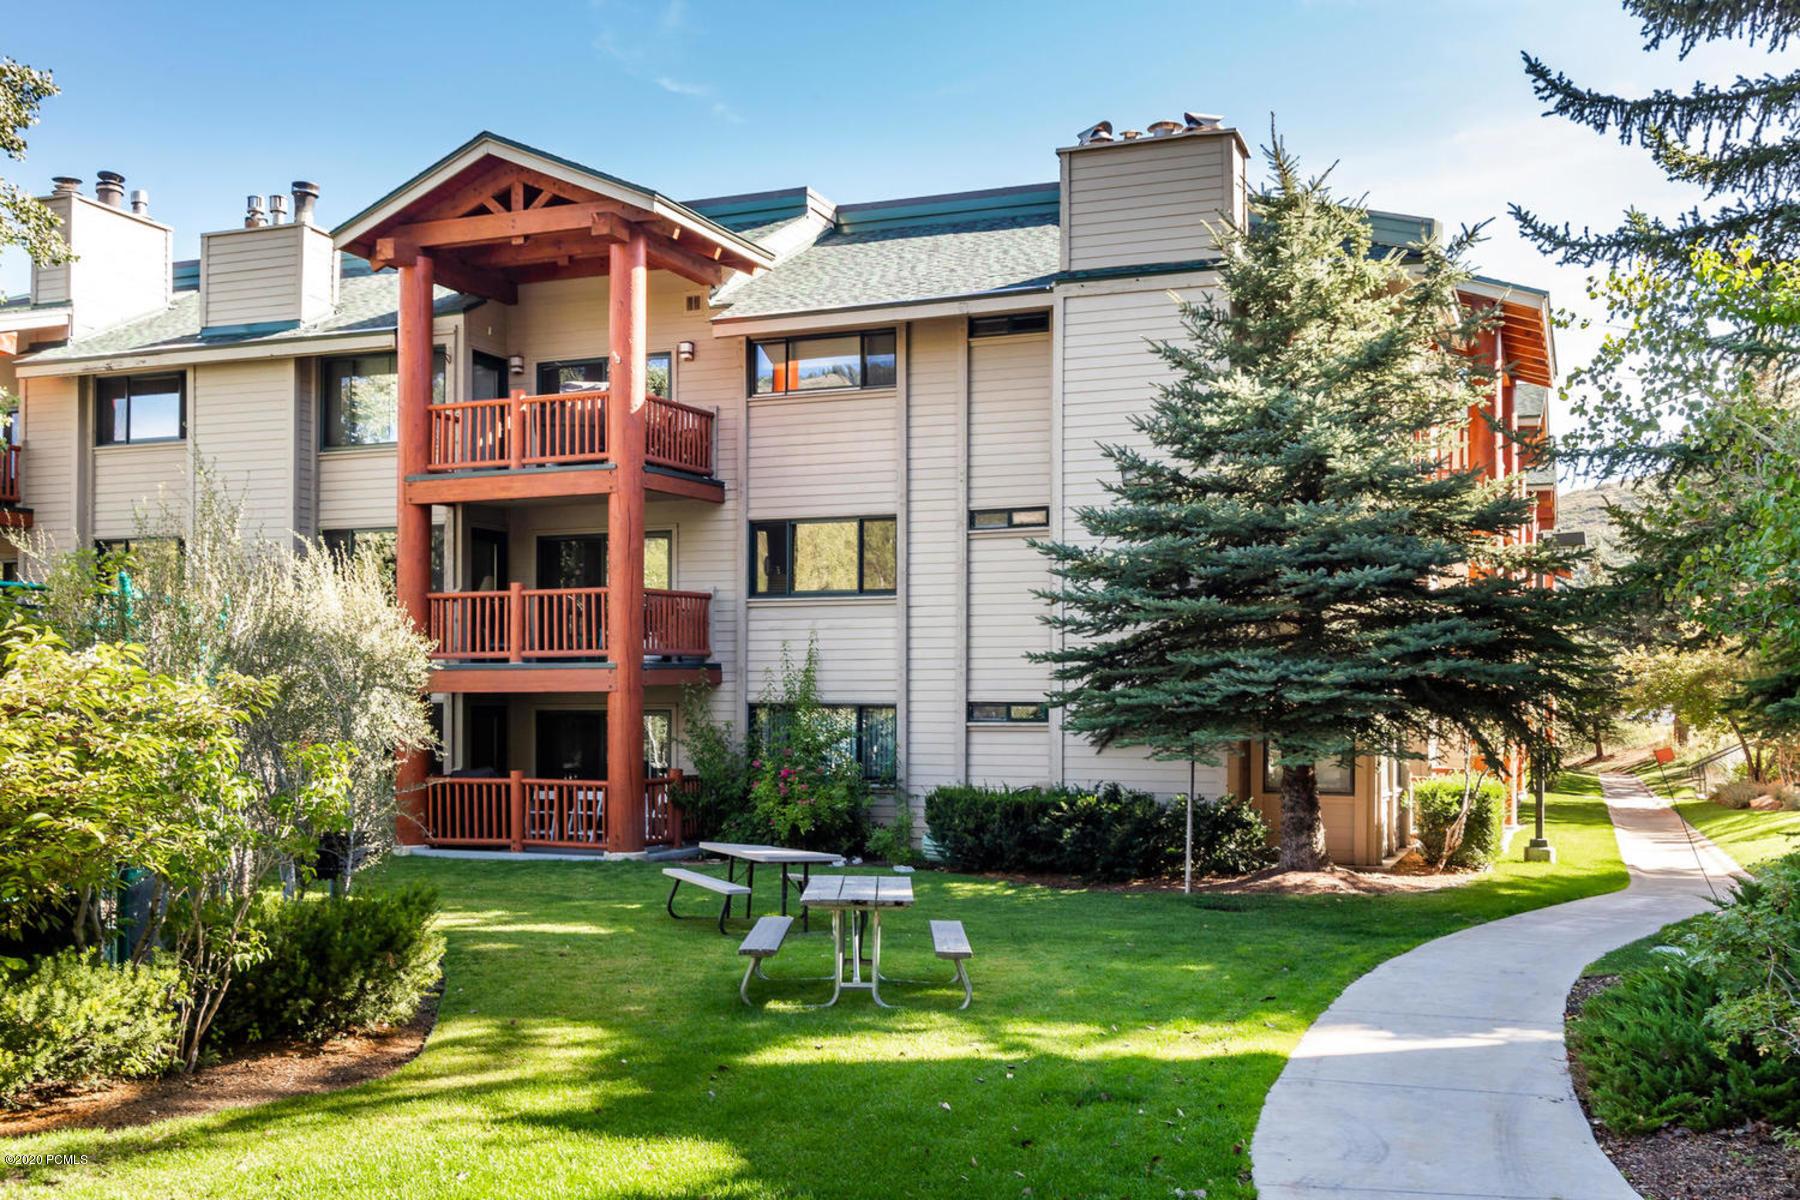 401 Silver King Drive, Park City, Utah 84060, 1 Bedroom Bedrooms, ,1 BathroomBathrooms,Condominium,For Sale,Silver King,12002133